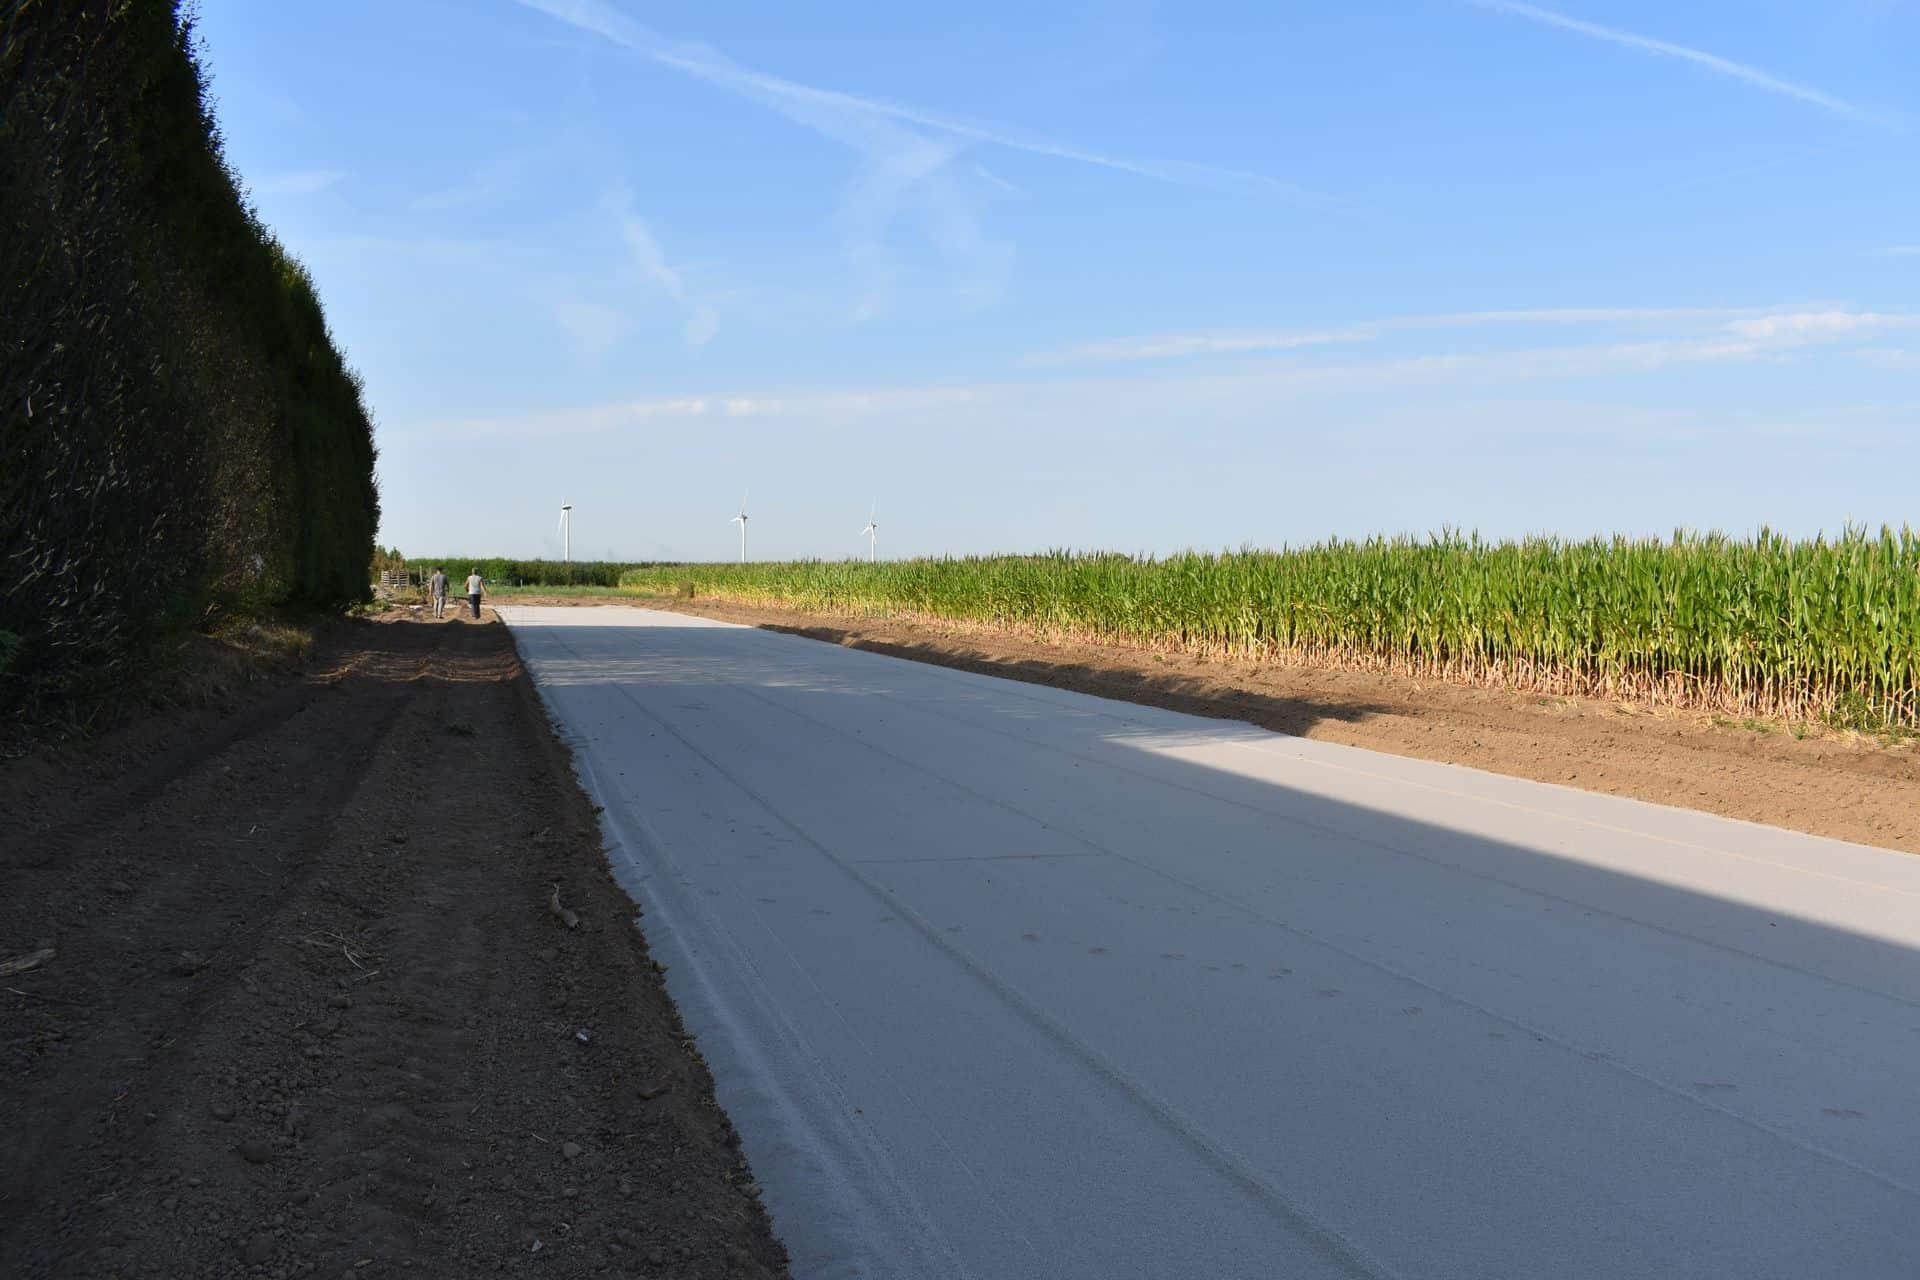 Geëgaliseerde zandbaan | Project kwekerij in Lienden